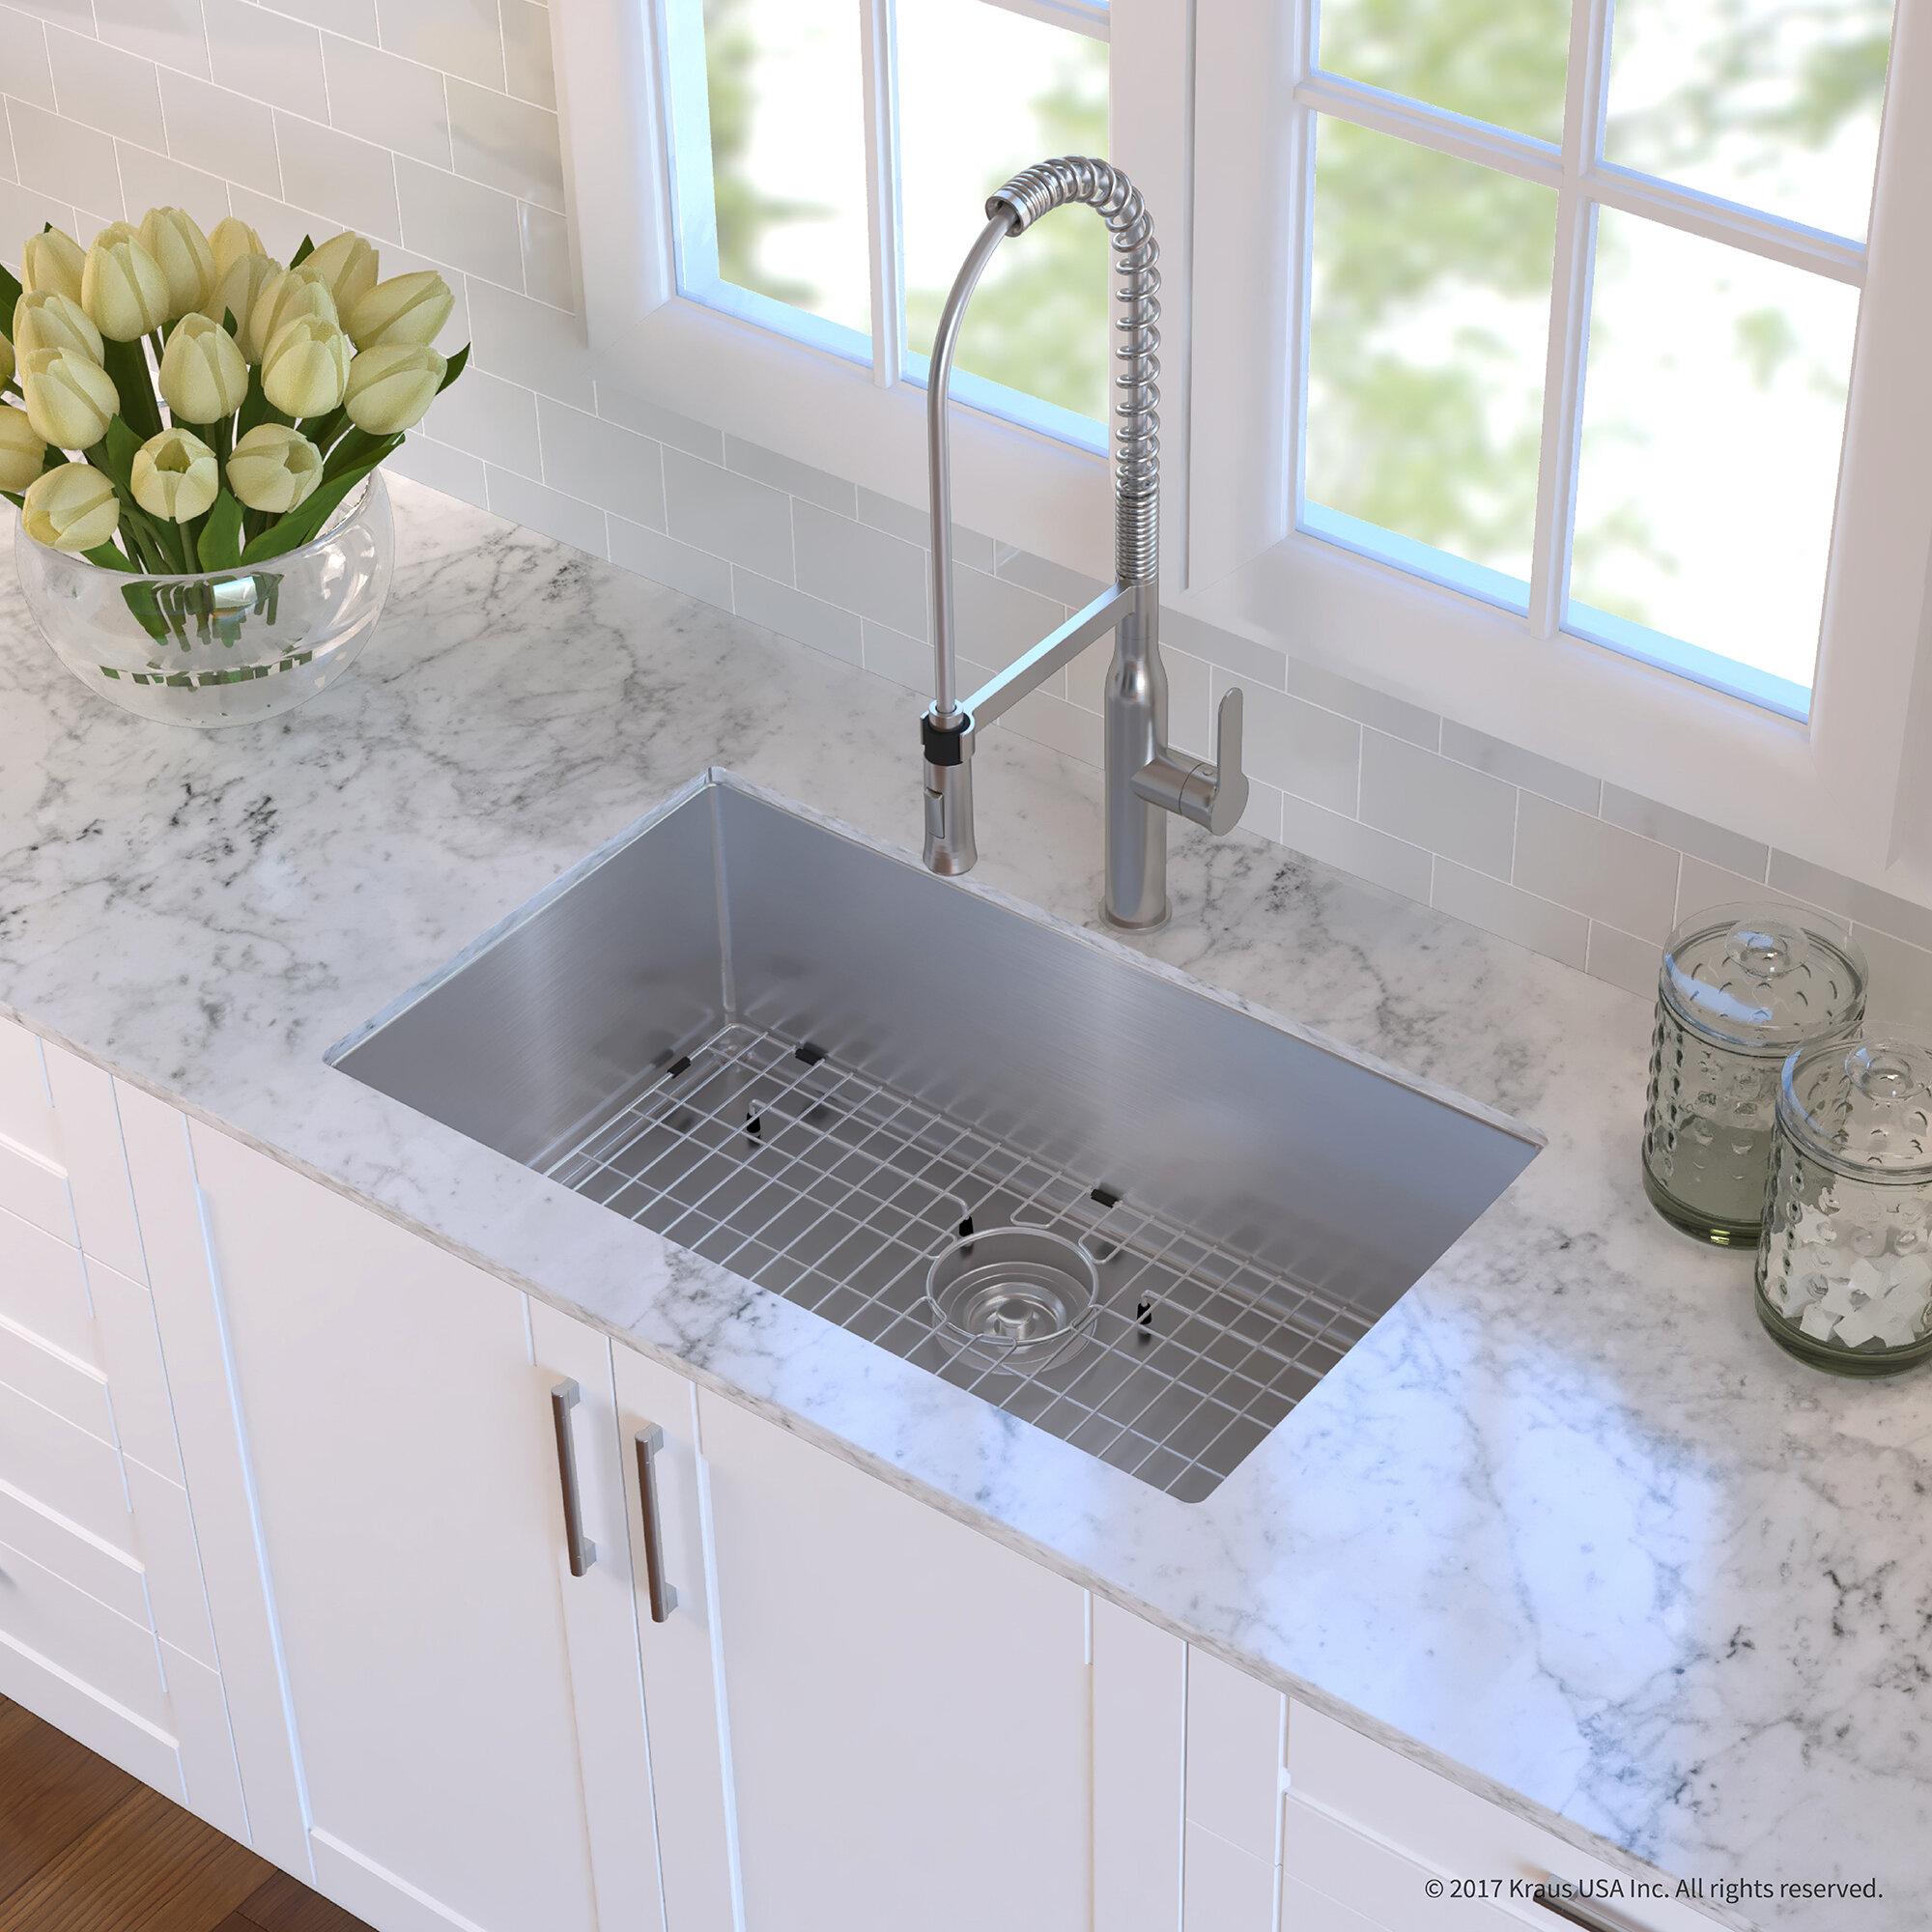 Khu100 30 1650 41ss Handmade Stainless Steel 16 Gauge L X 18 W Undermount Kitchen Sink With Faucet